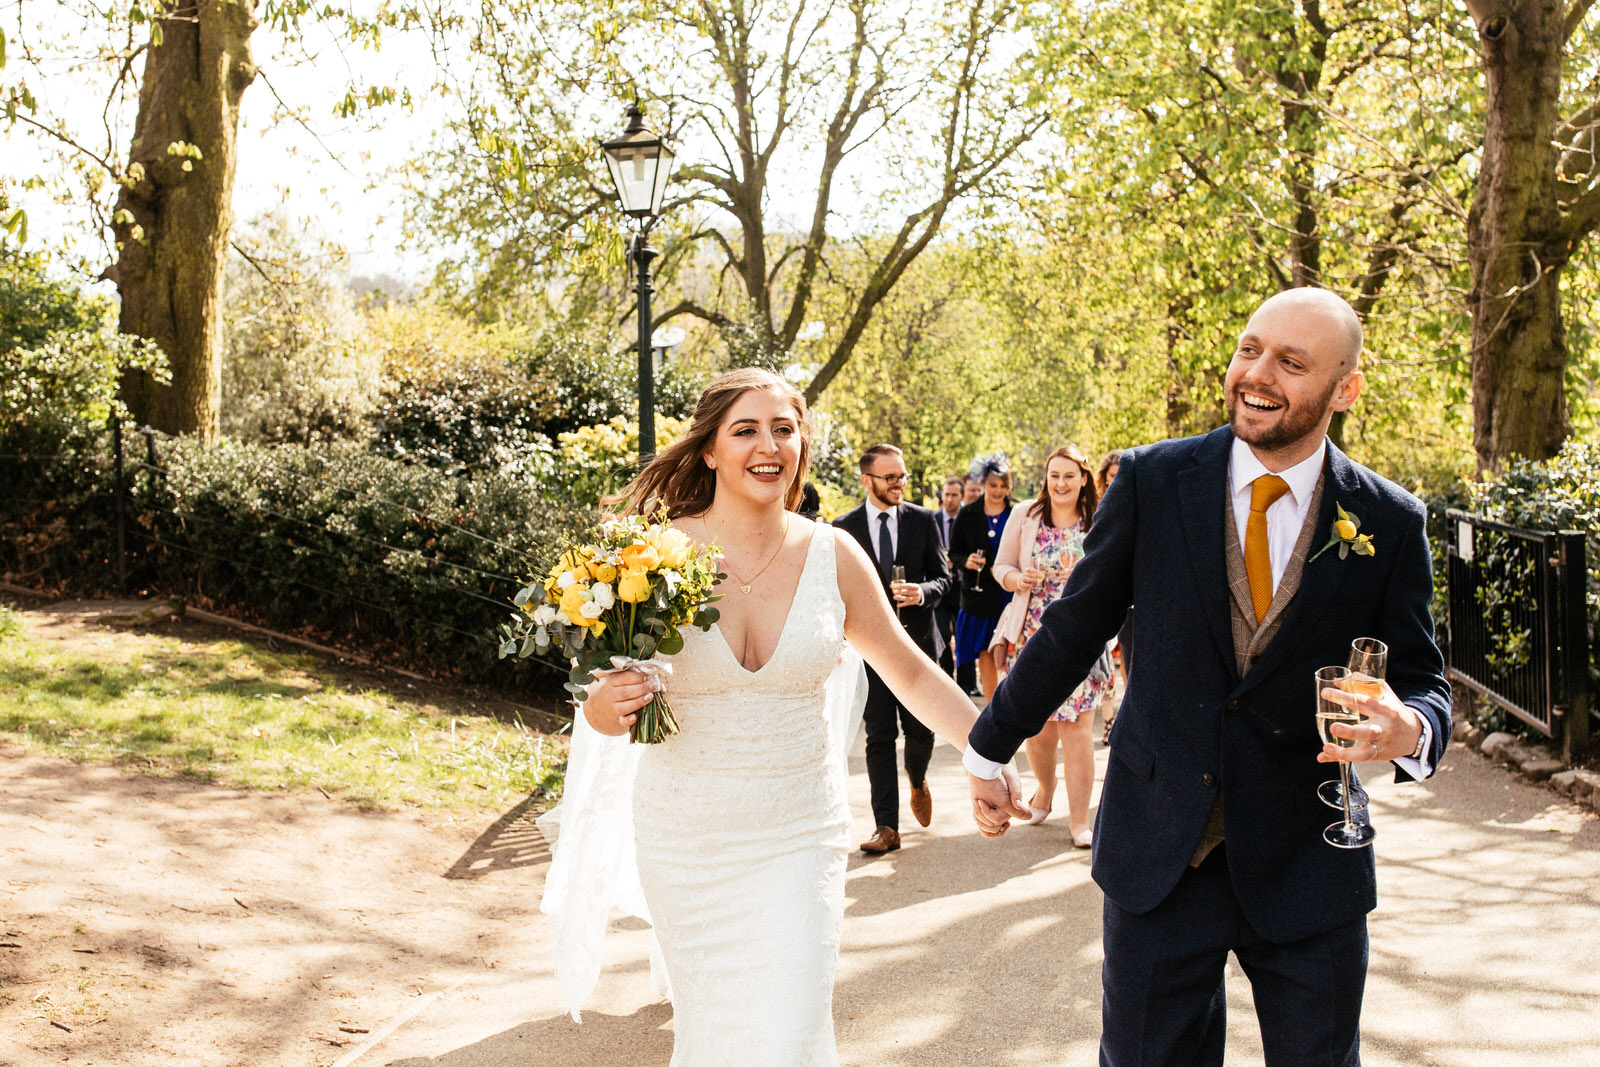 Jenni-and-James-Wedding-Highlights-22.jpg